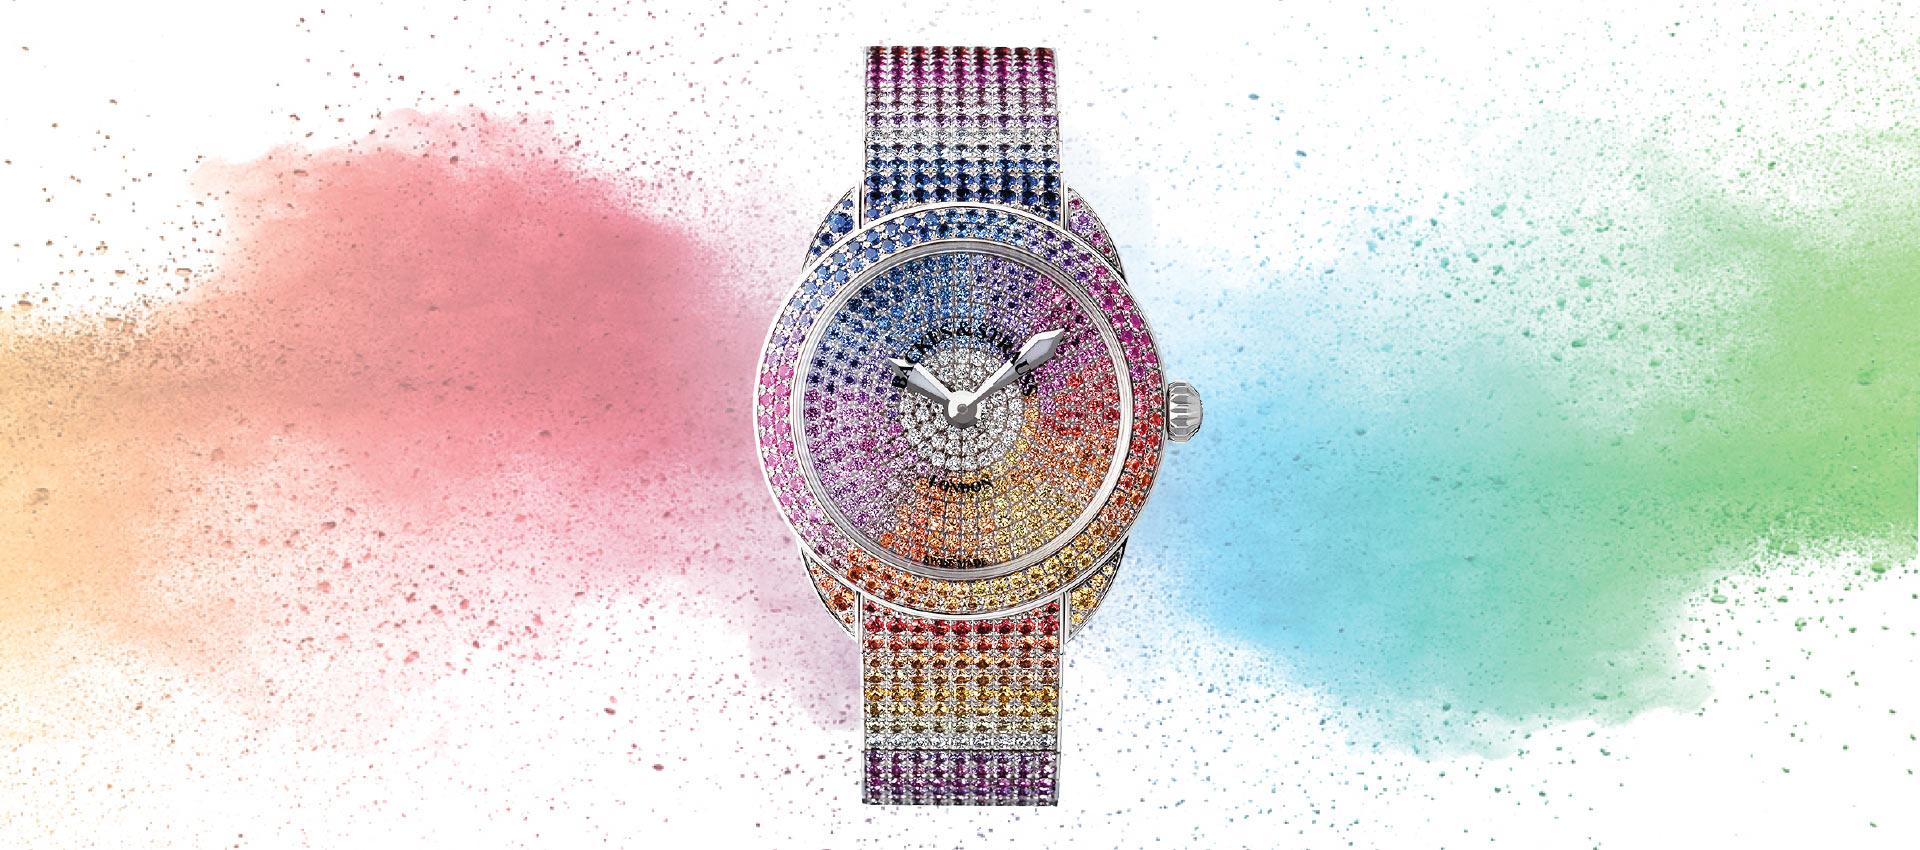 Piccadilly Renaissance Ballerina Rainbow diamond encrusted watch